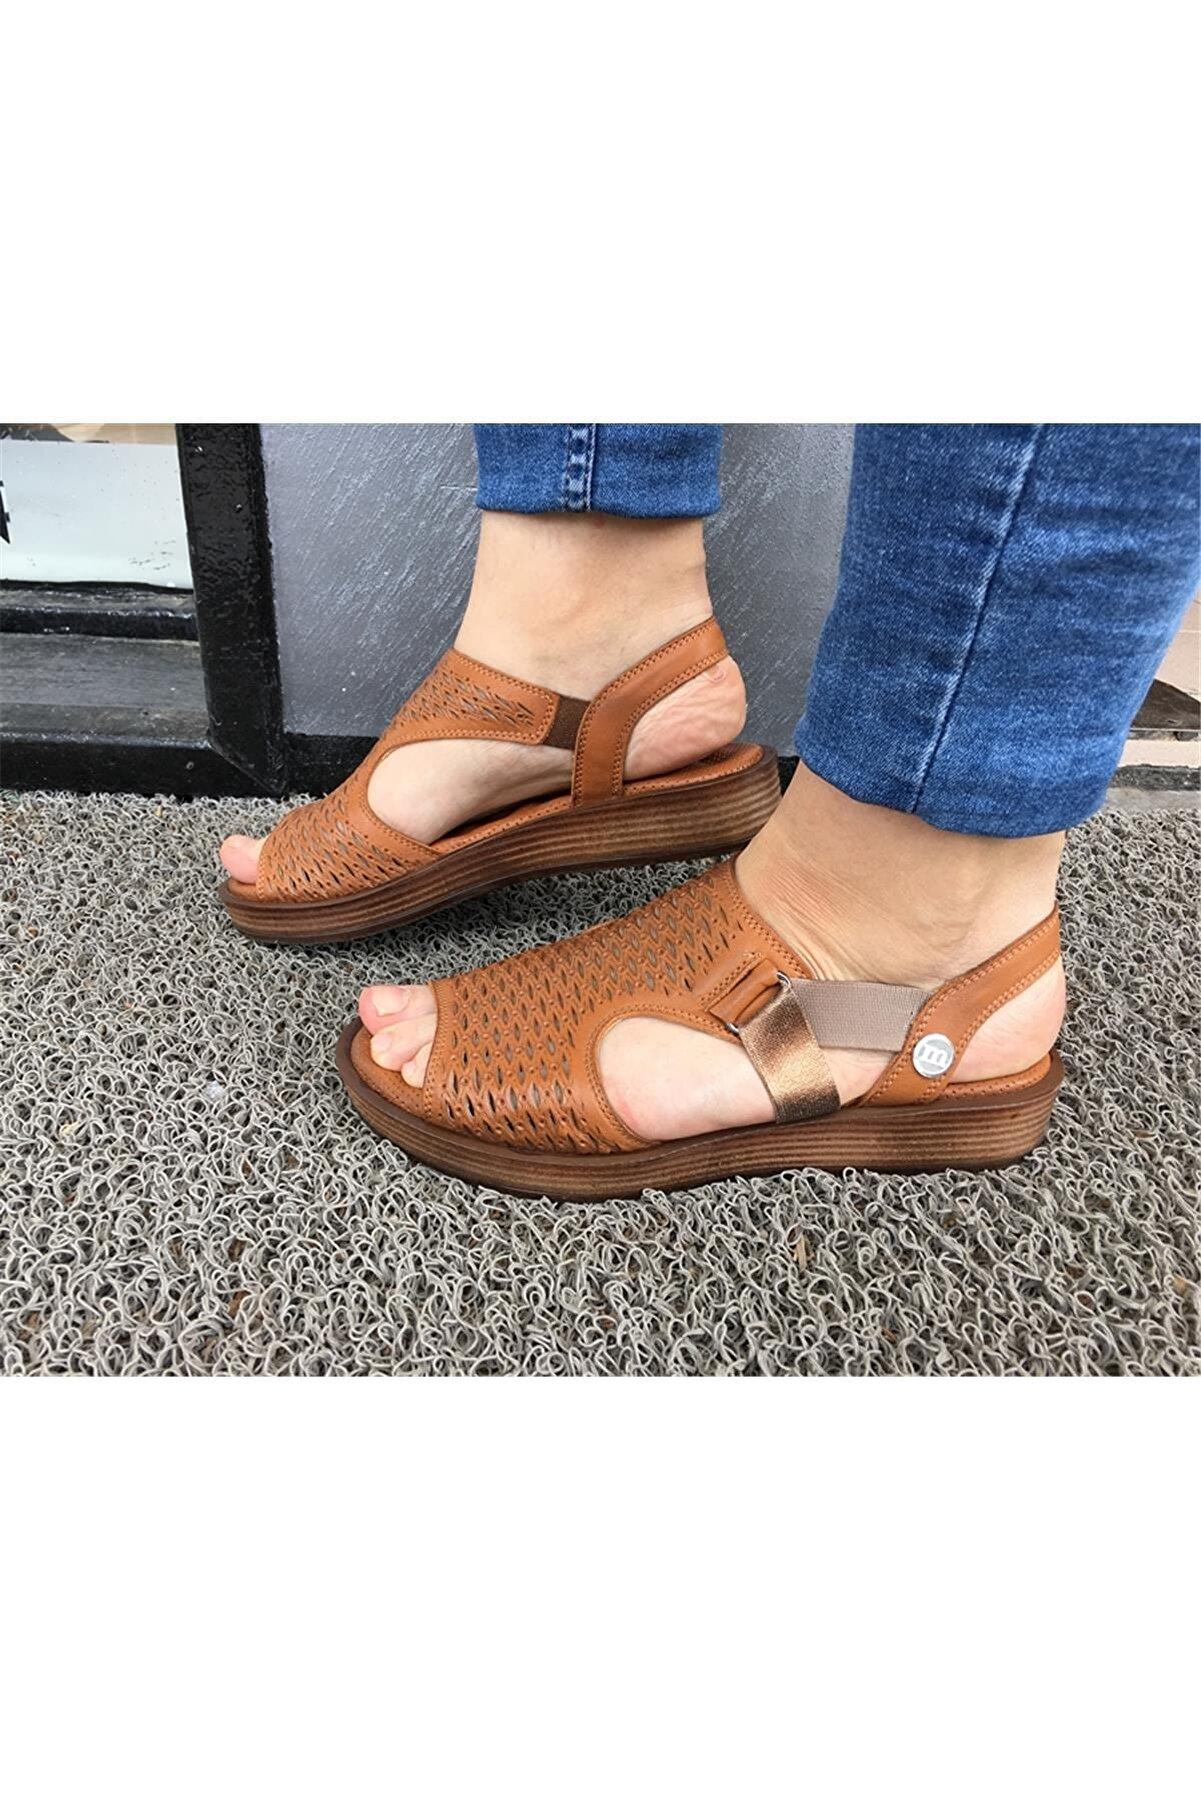 Mammamia Kadın Kahverengi Sandalet D20ys-1645